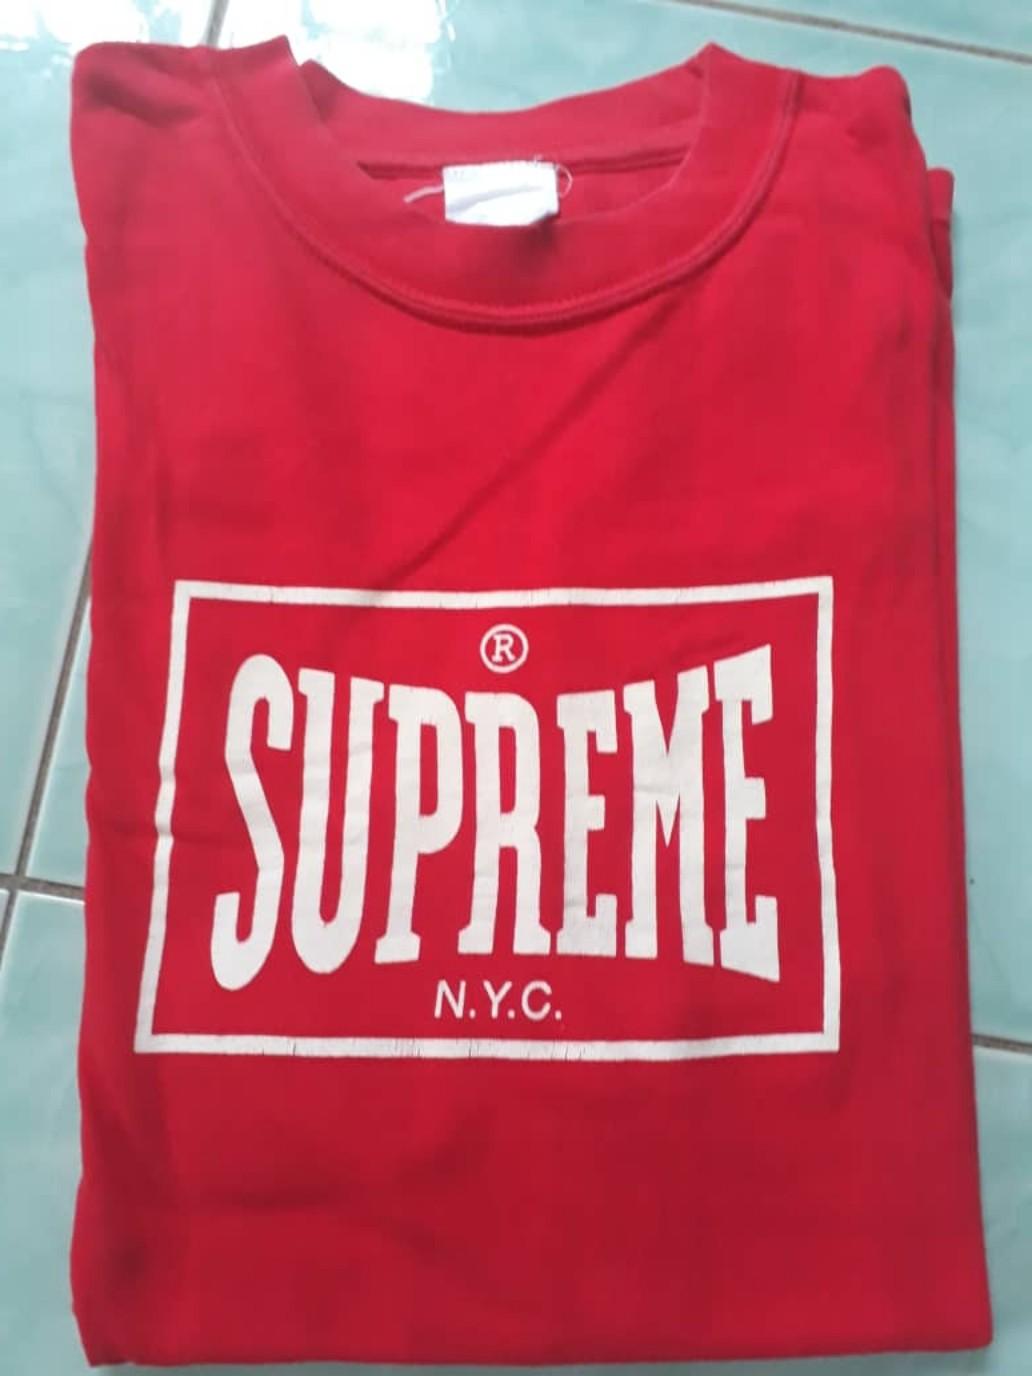 94cbb957 Supreme Everlast, Men's Fashion, Clothes, Tops on Carousell